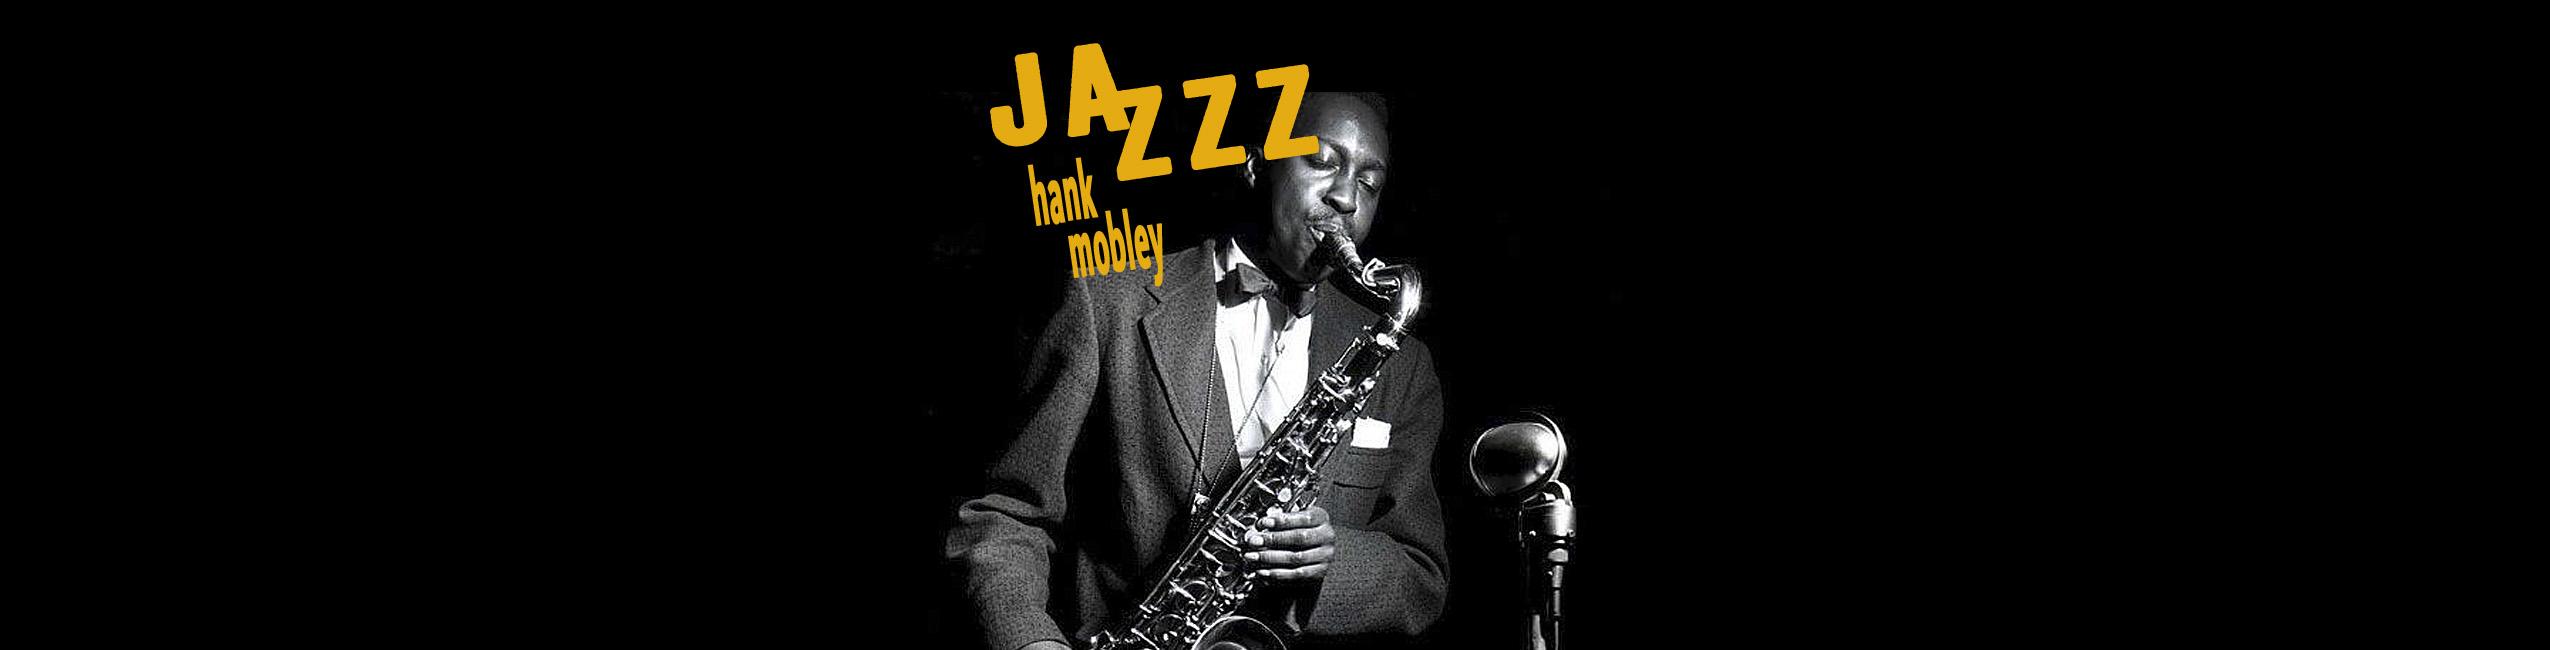 Jazz cafe de Kroon hank mobley 2020